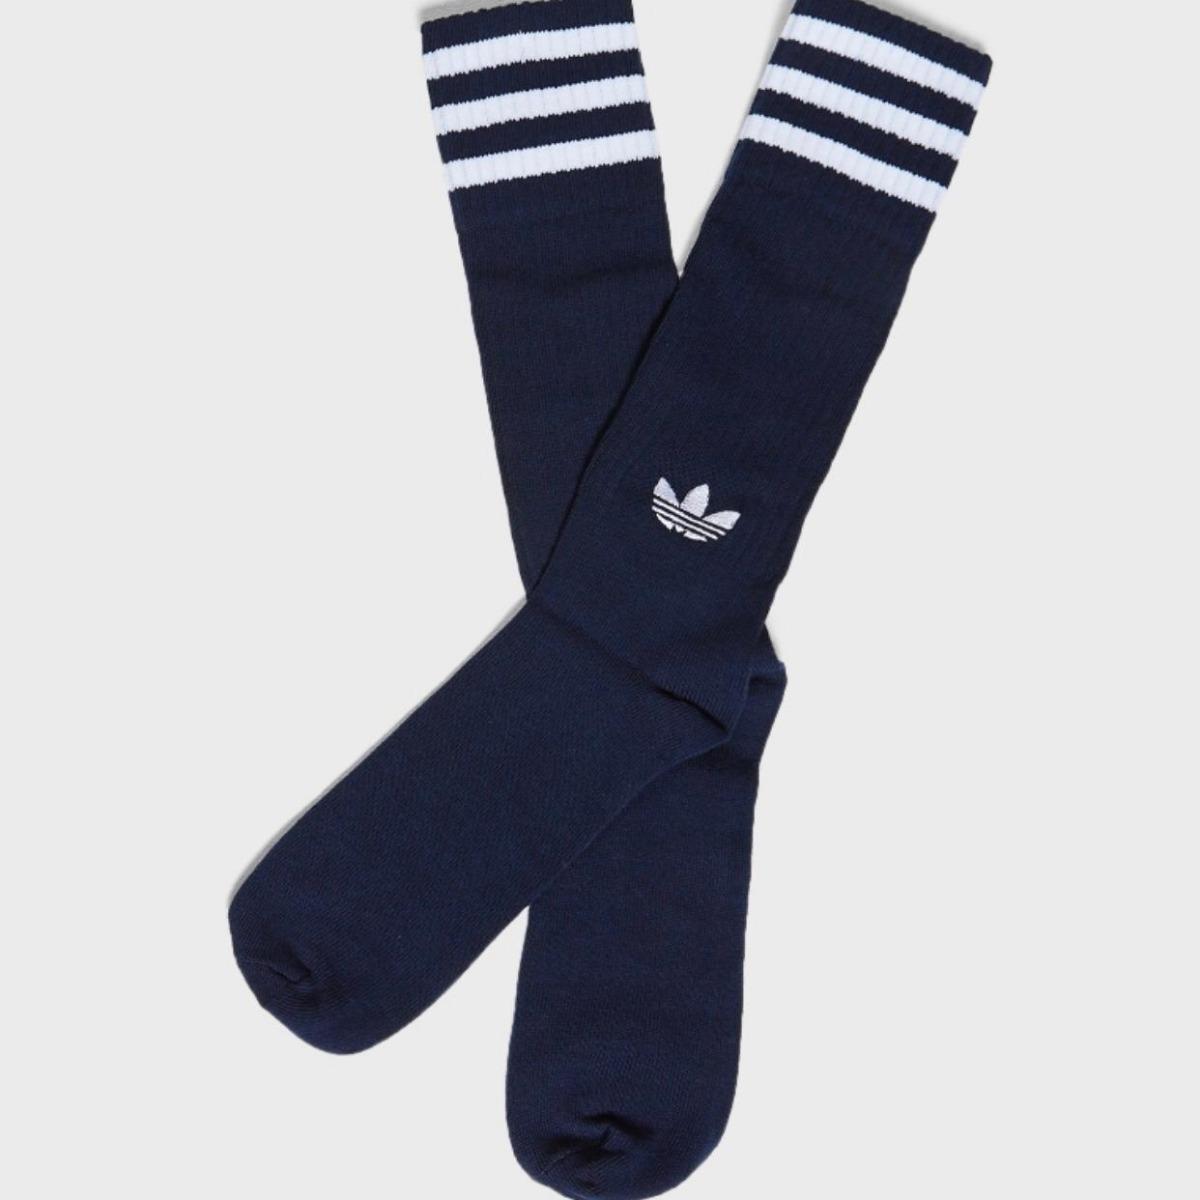 710417770 Características. Marca Adidas  Modelo Solid Crew. Gênero Masculino  Tipo de meias  Cano Alto ...